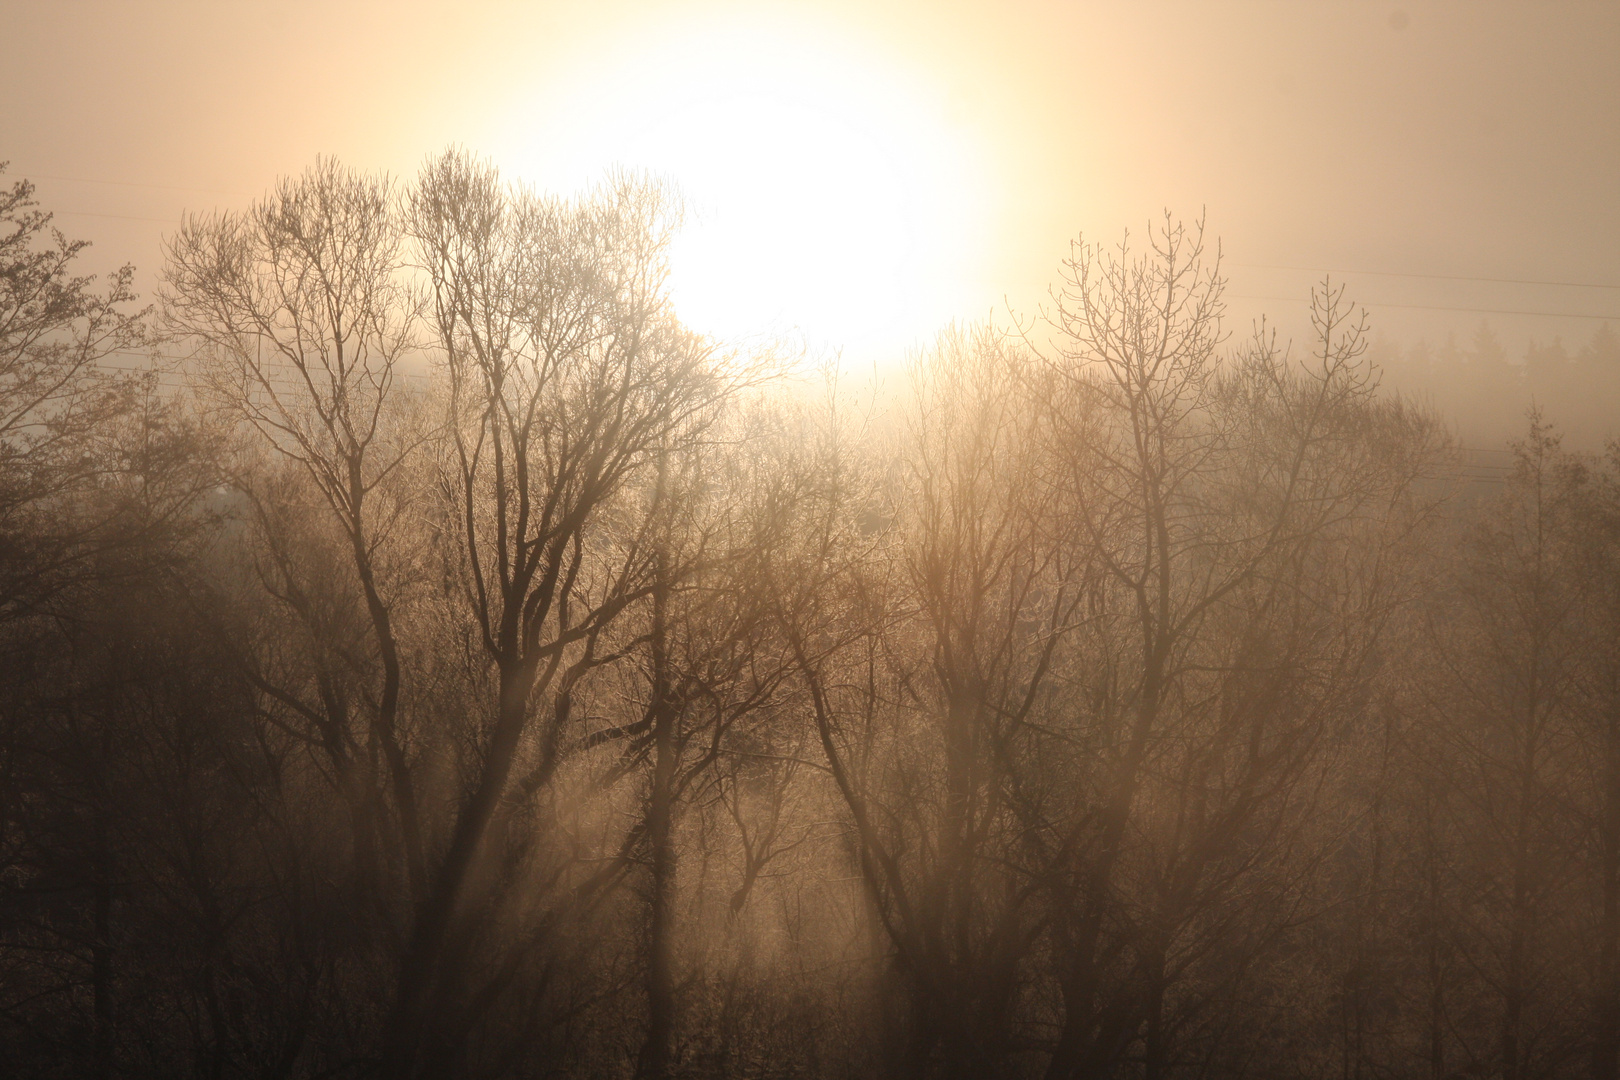 Sonnenaufgang über dem Wald